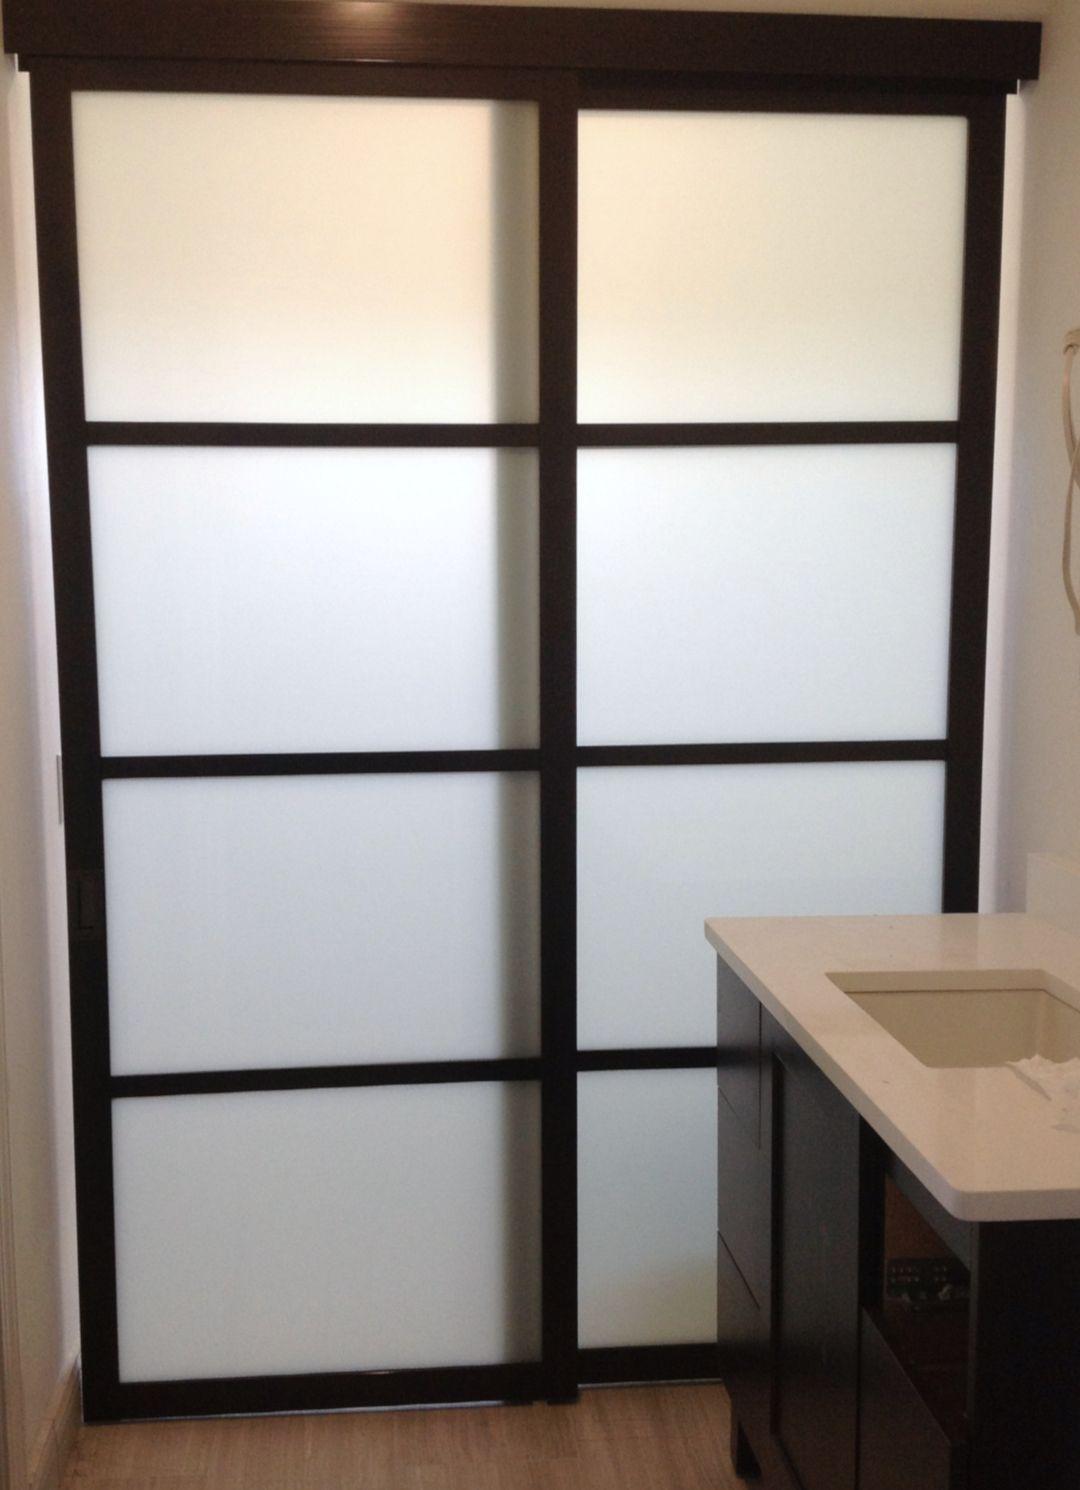 Shoji Style Sliding Glass Door For Bathroom Glass Closet Sliding Glass Door Glass Closet Doors